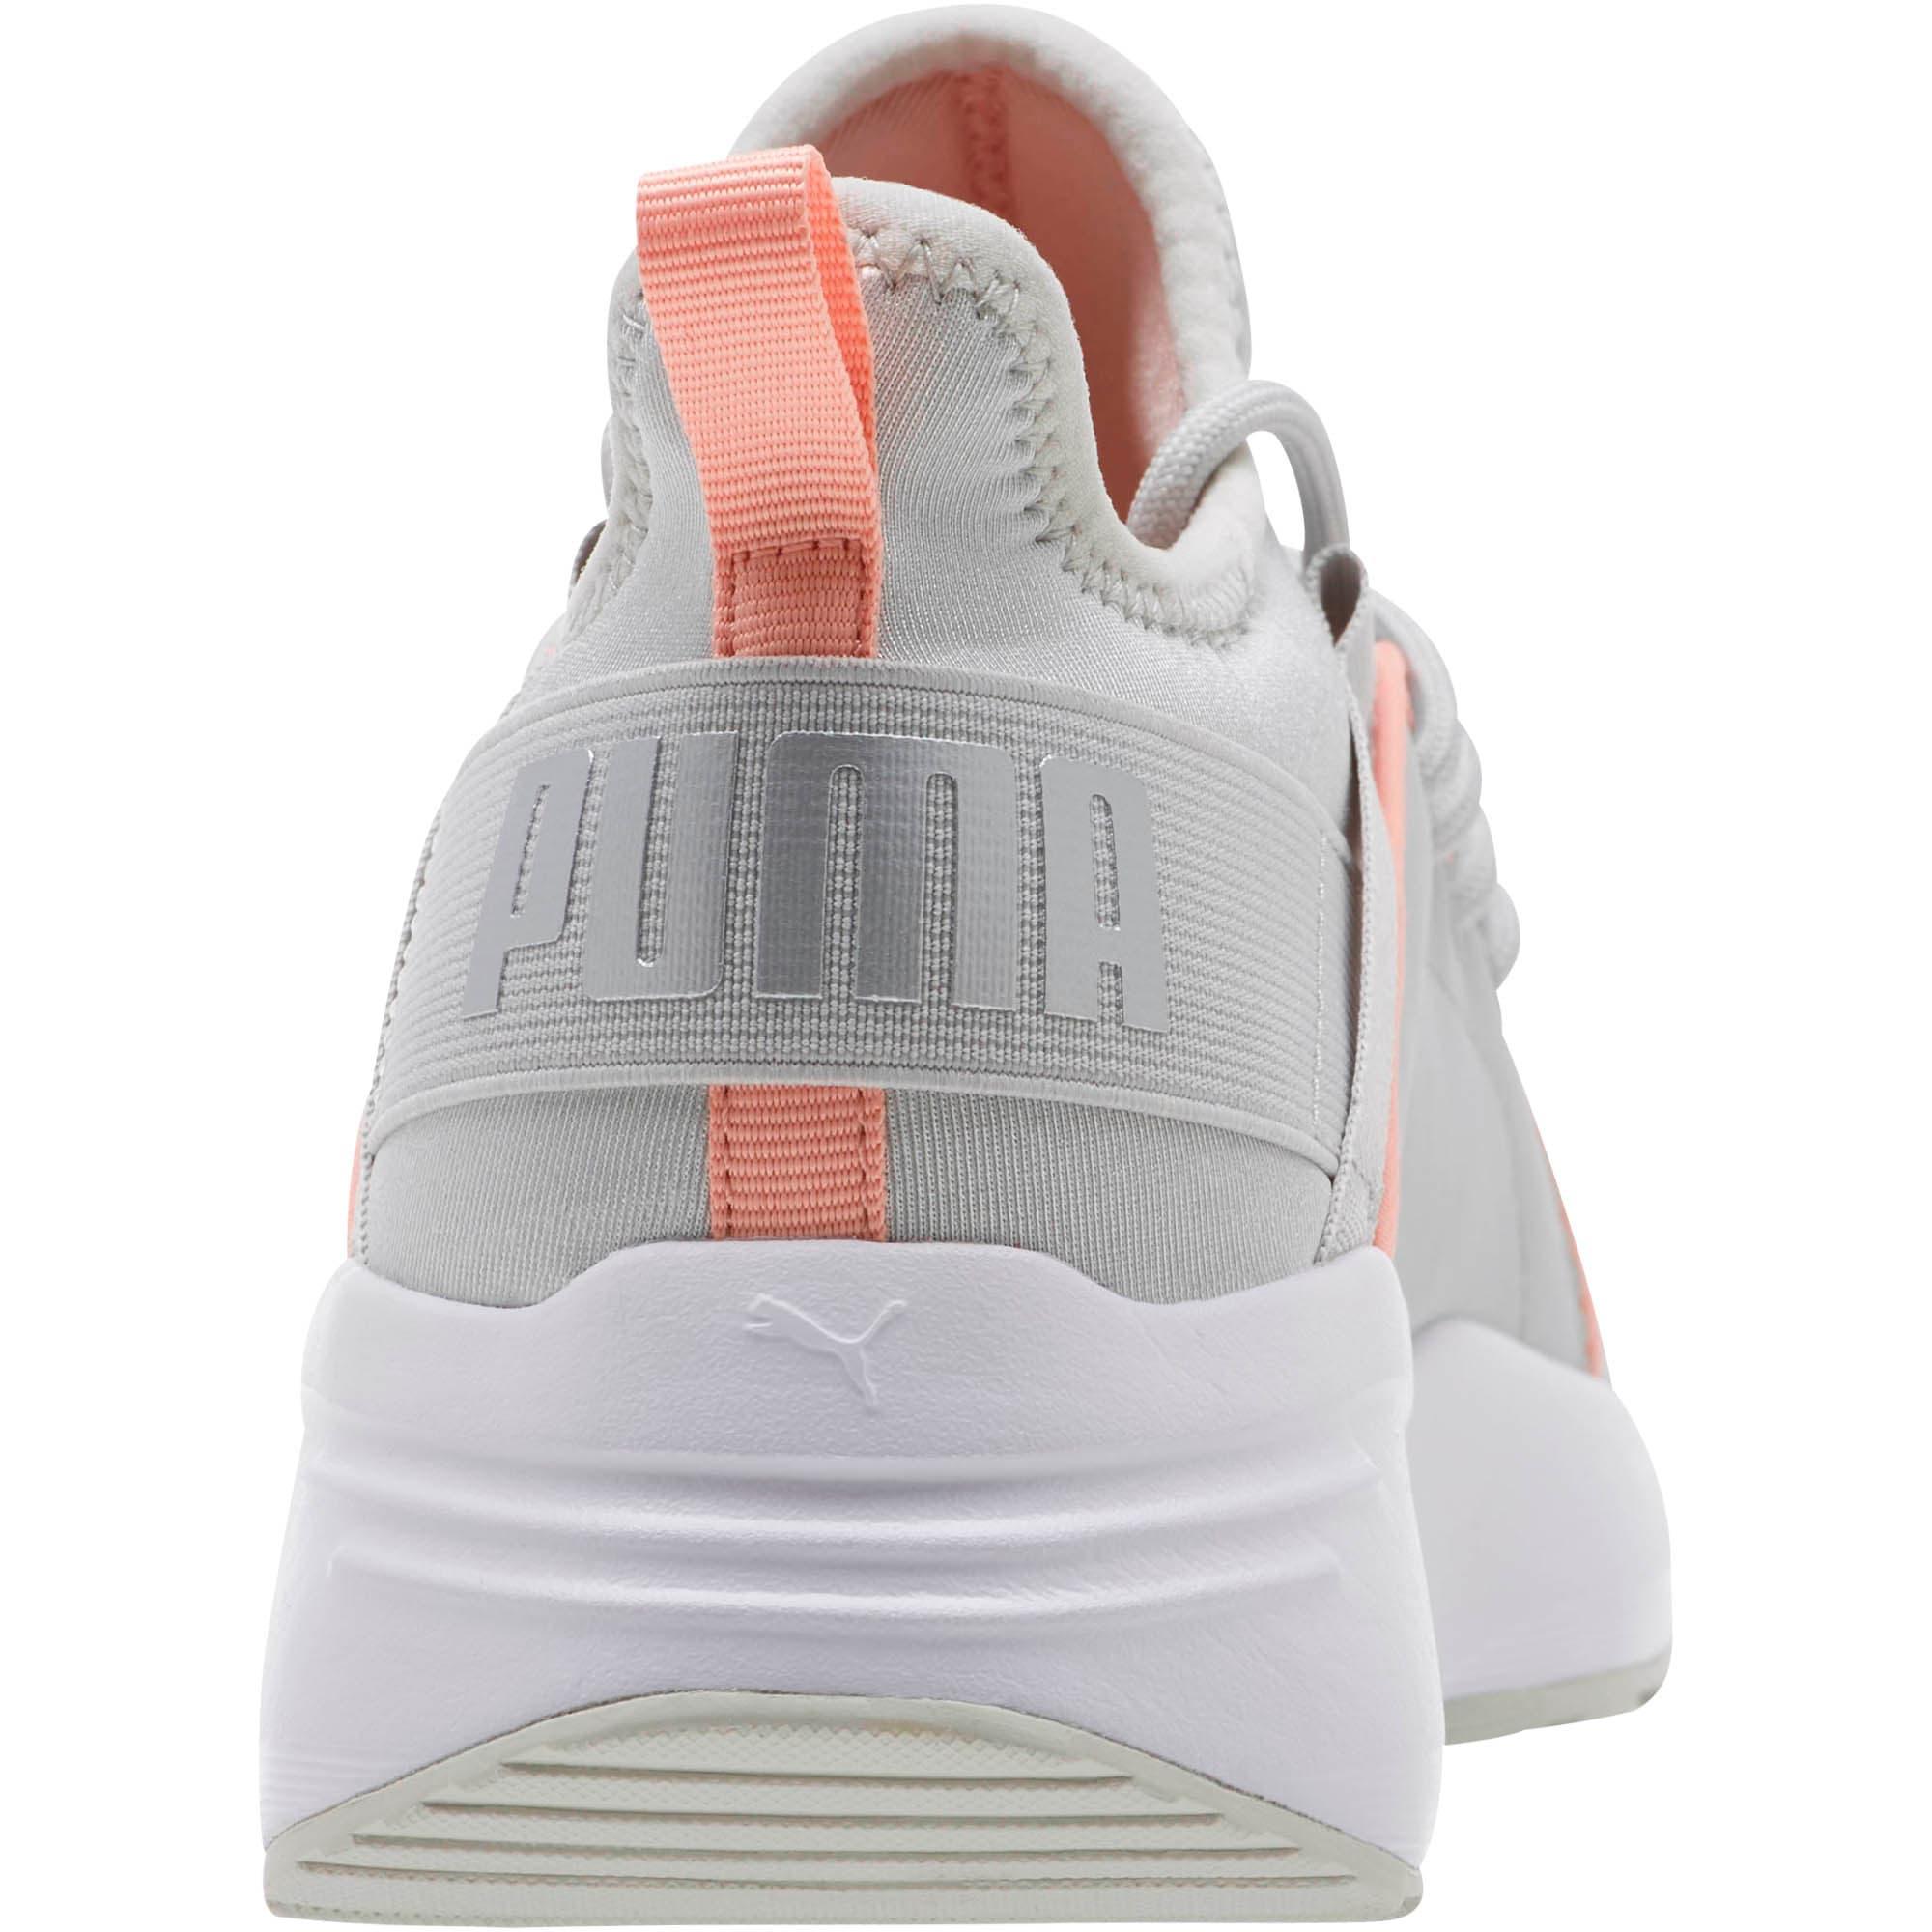 Thumbnail 4 of Sirena Women's Training Shoes, Glacier Gray-Peach Bud, medium